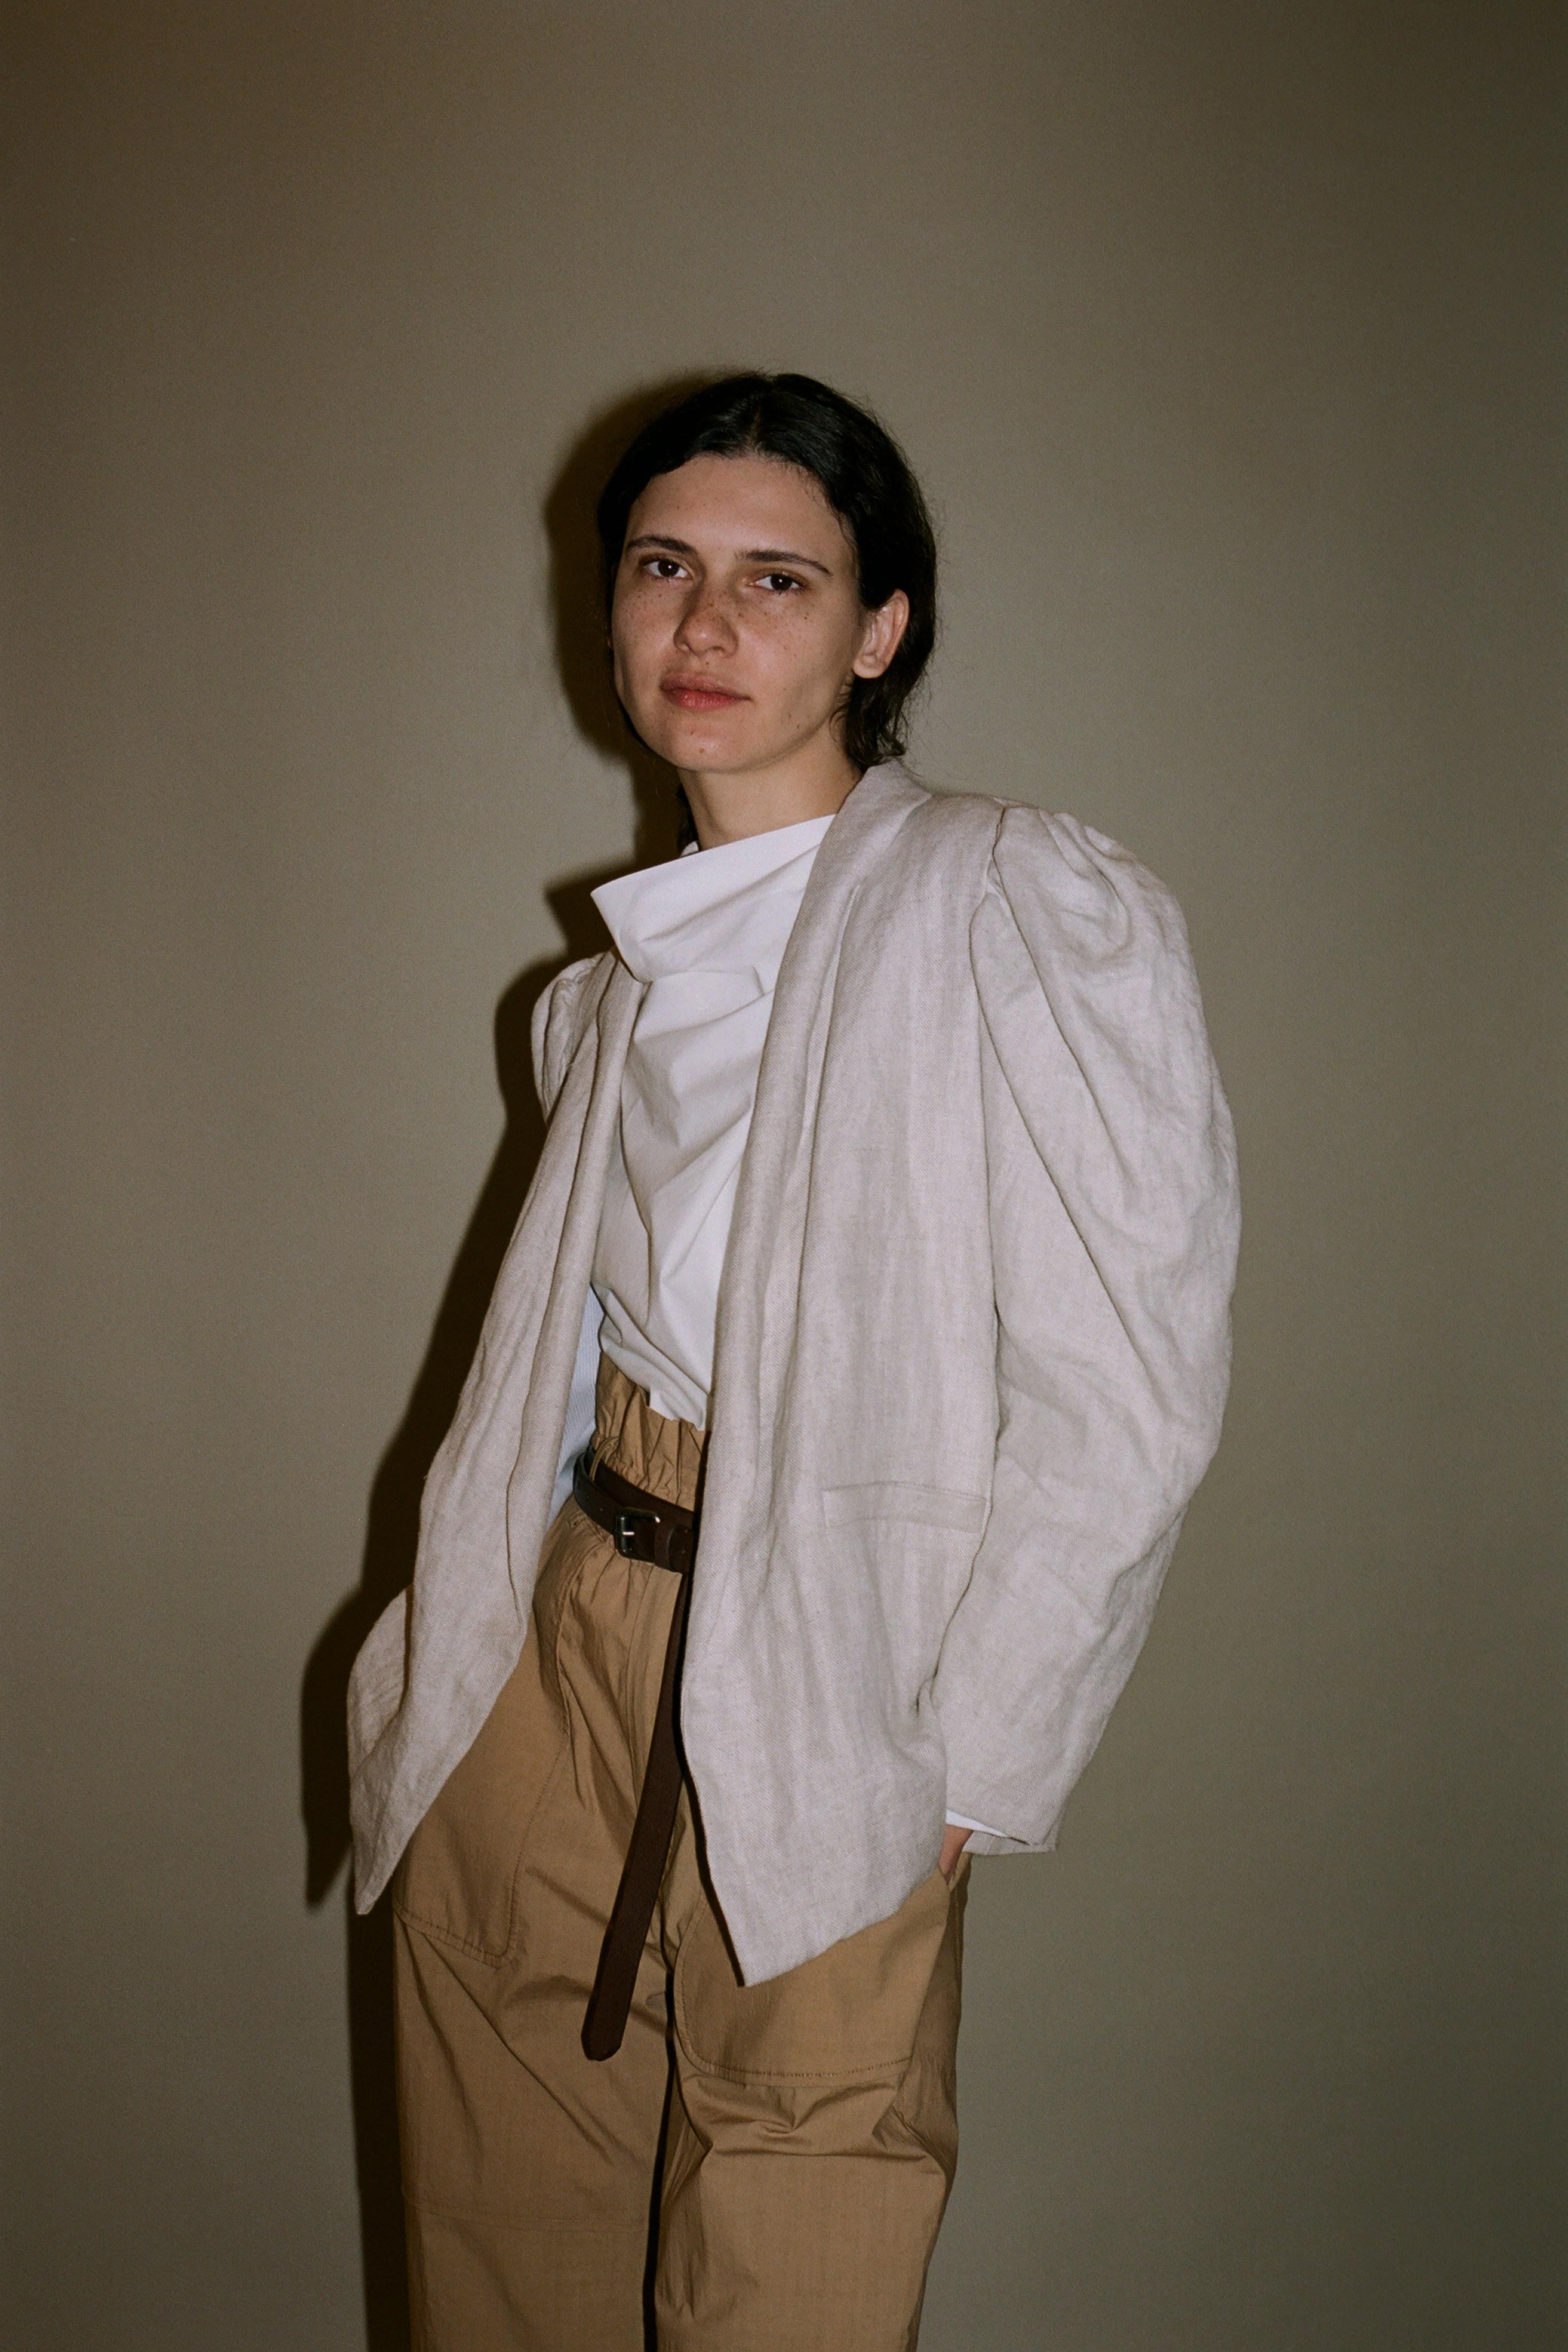 Leon linen blazer, Clara cotton blouse, Scott Pant